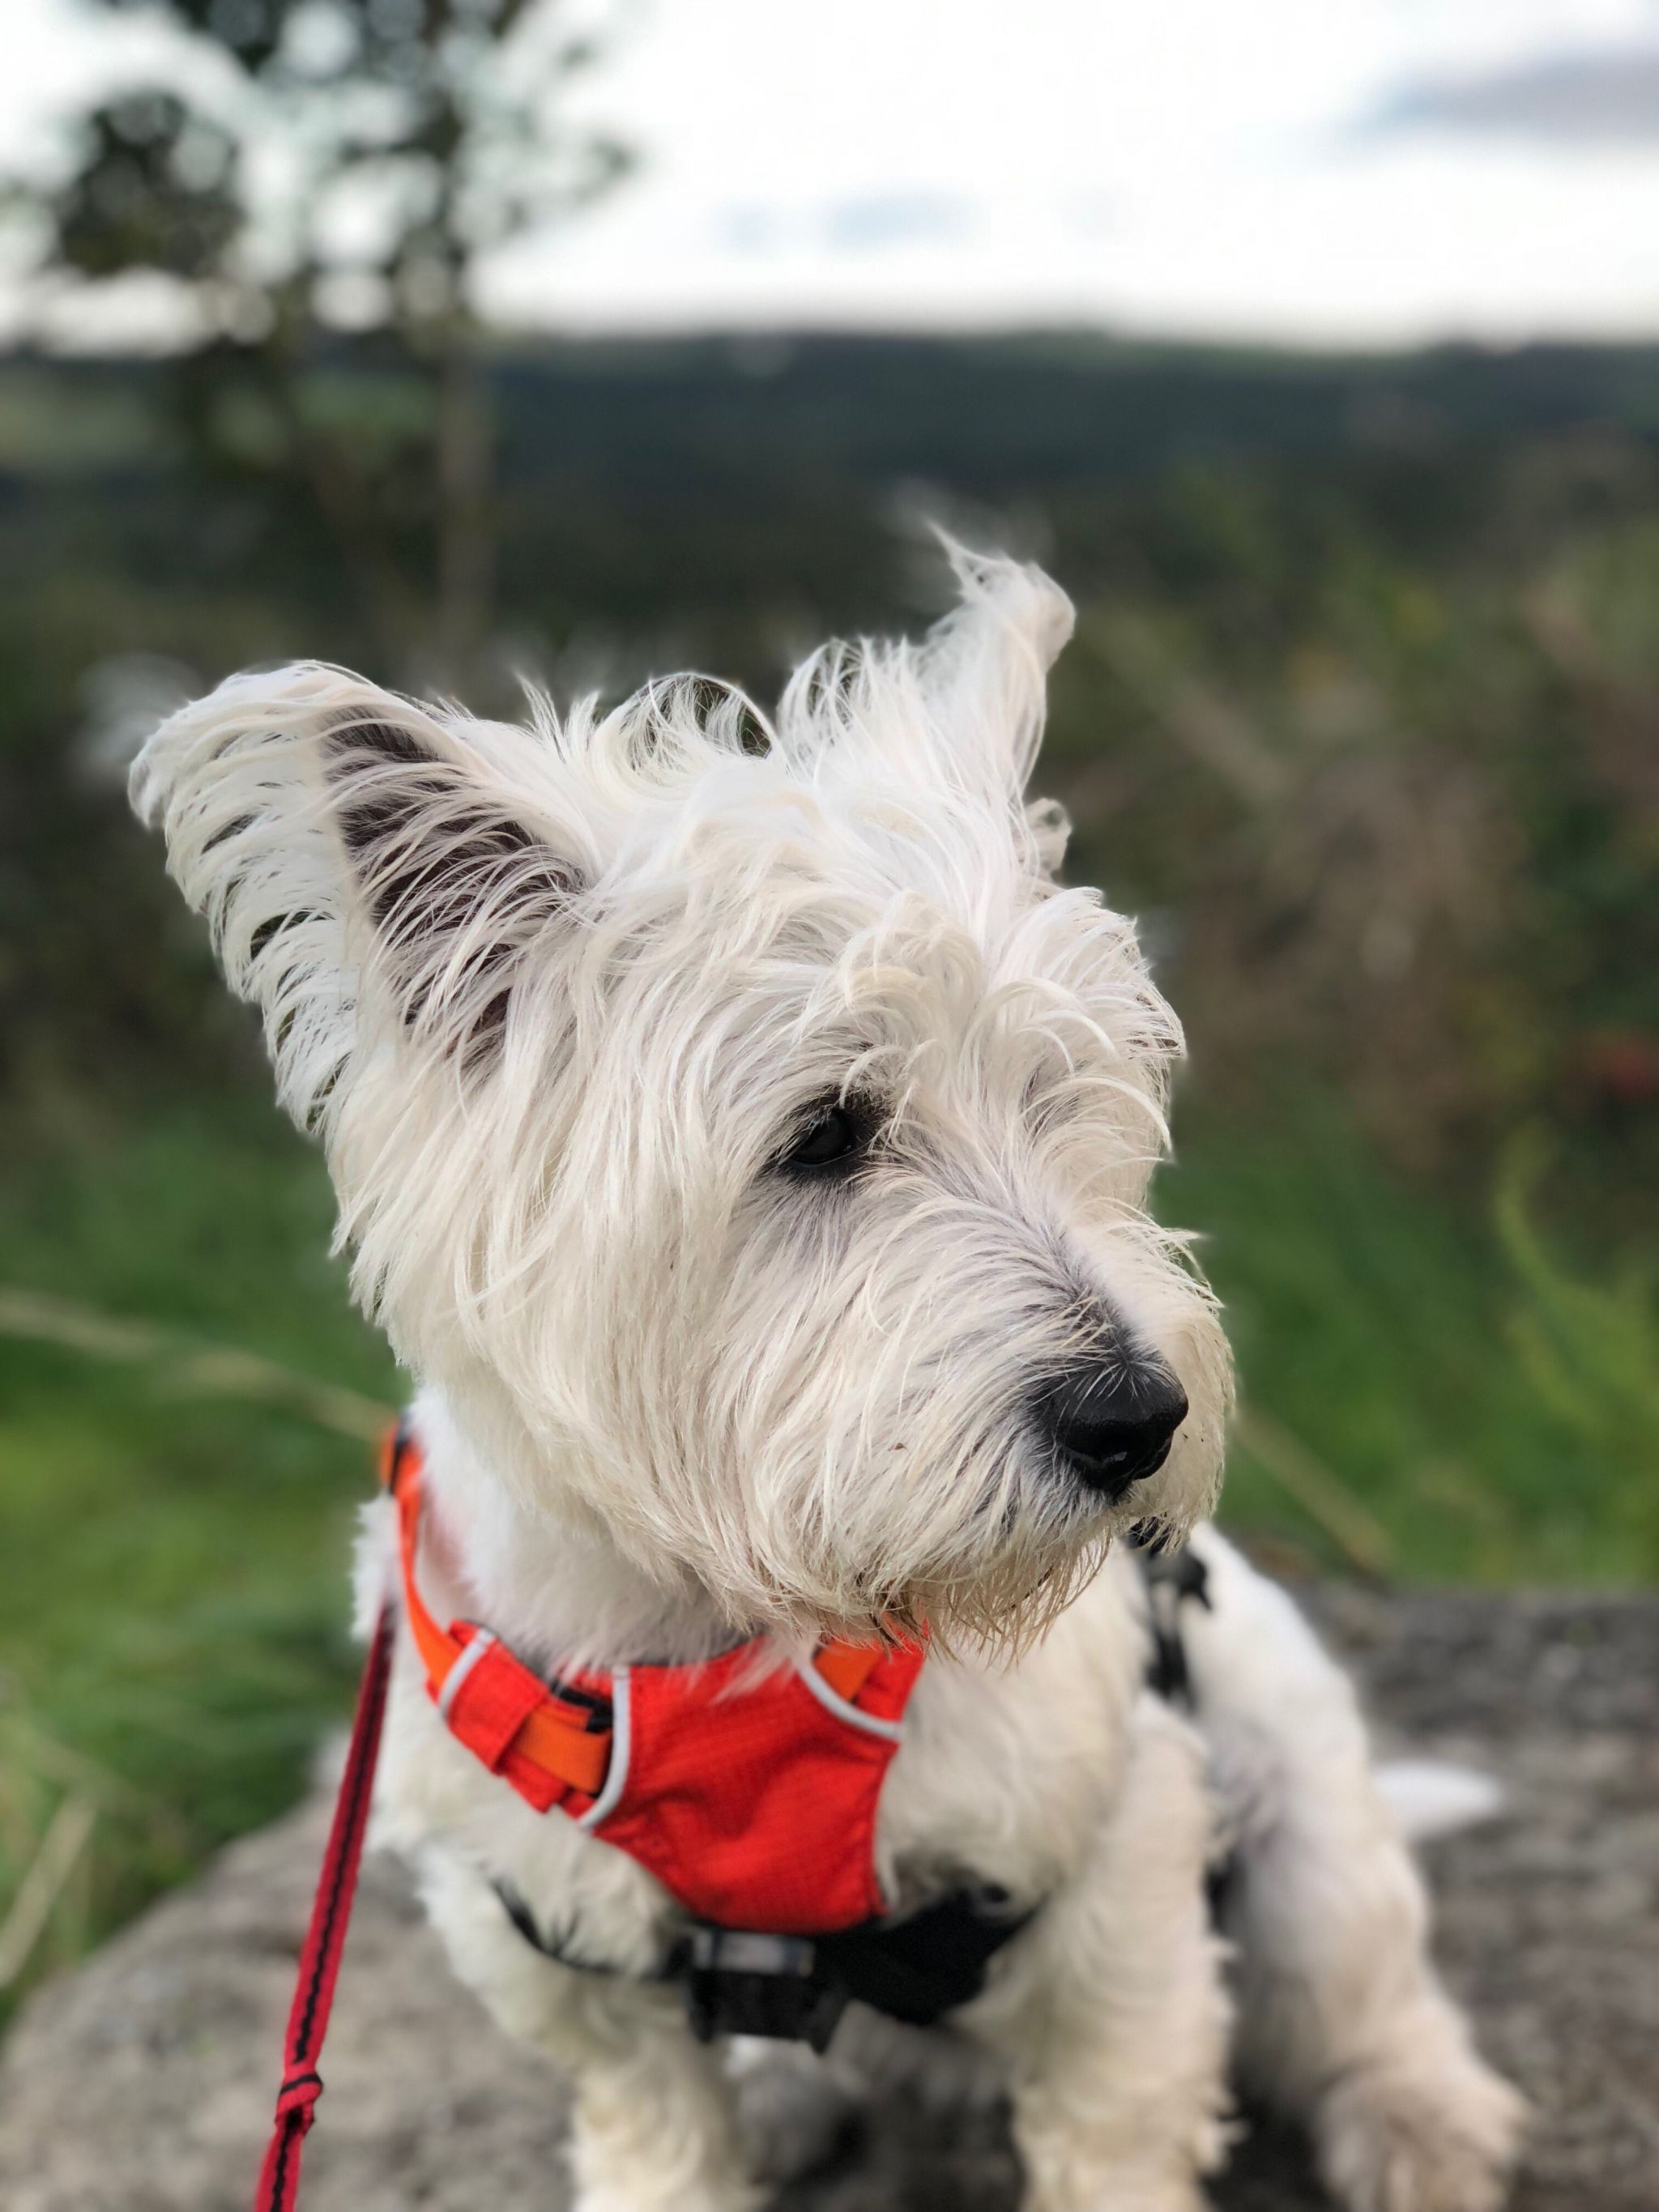 Exploring Derwent County Park & Our 1 Year Borrowmydoggy anniversary!